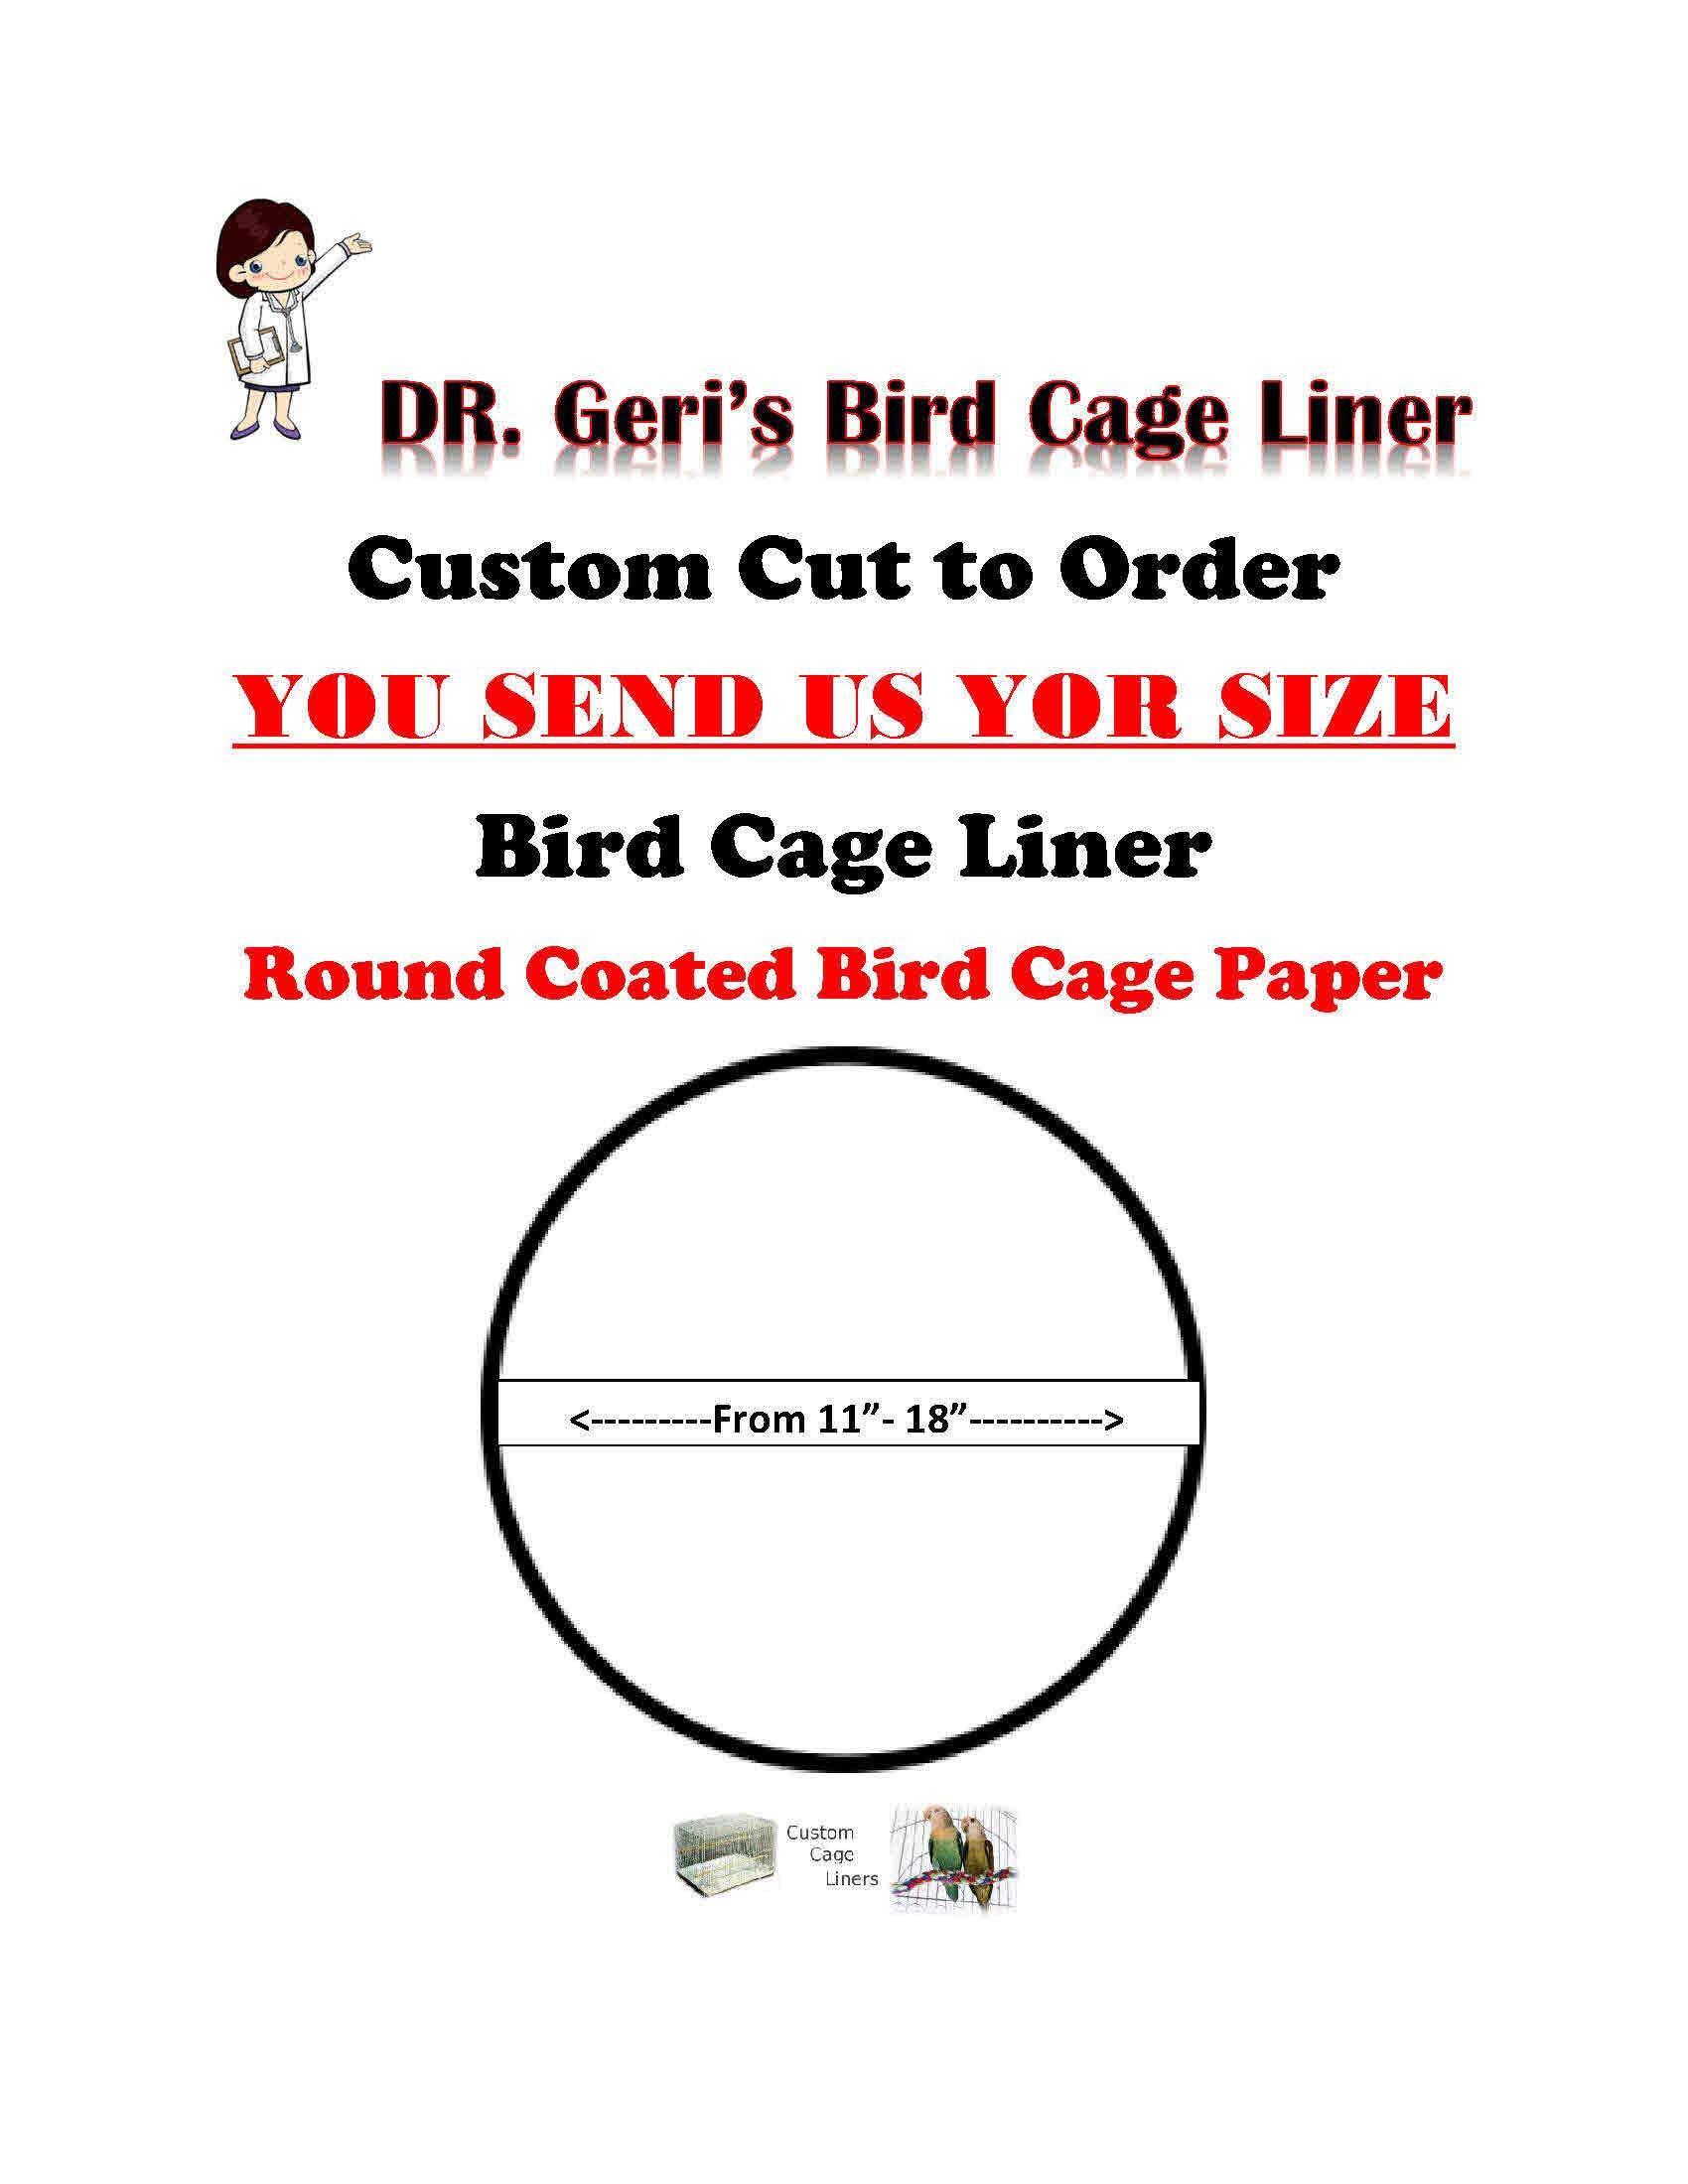 Dr.Geri's Bird Cage Liner Custom Cut Liner WE Cut to Size Cut IT to Your Specs Bird Cage Liner Plain 60lb Paper/40lb Paper (Round Coated 14'') by Dr.Geri's